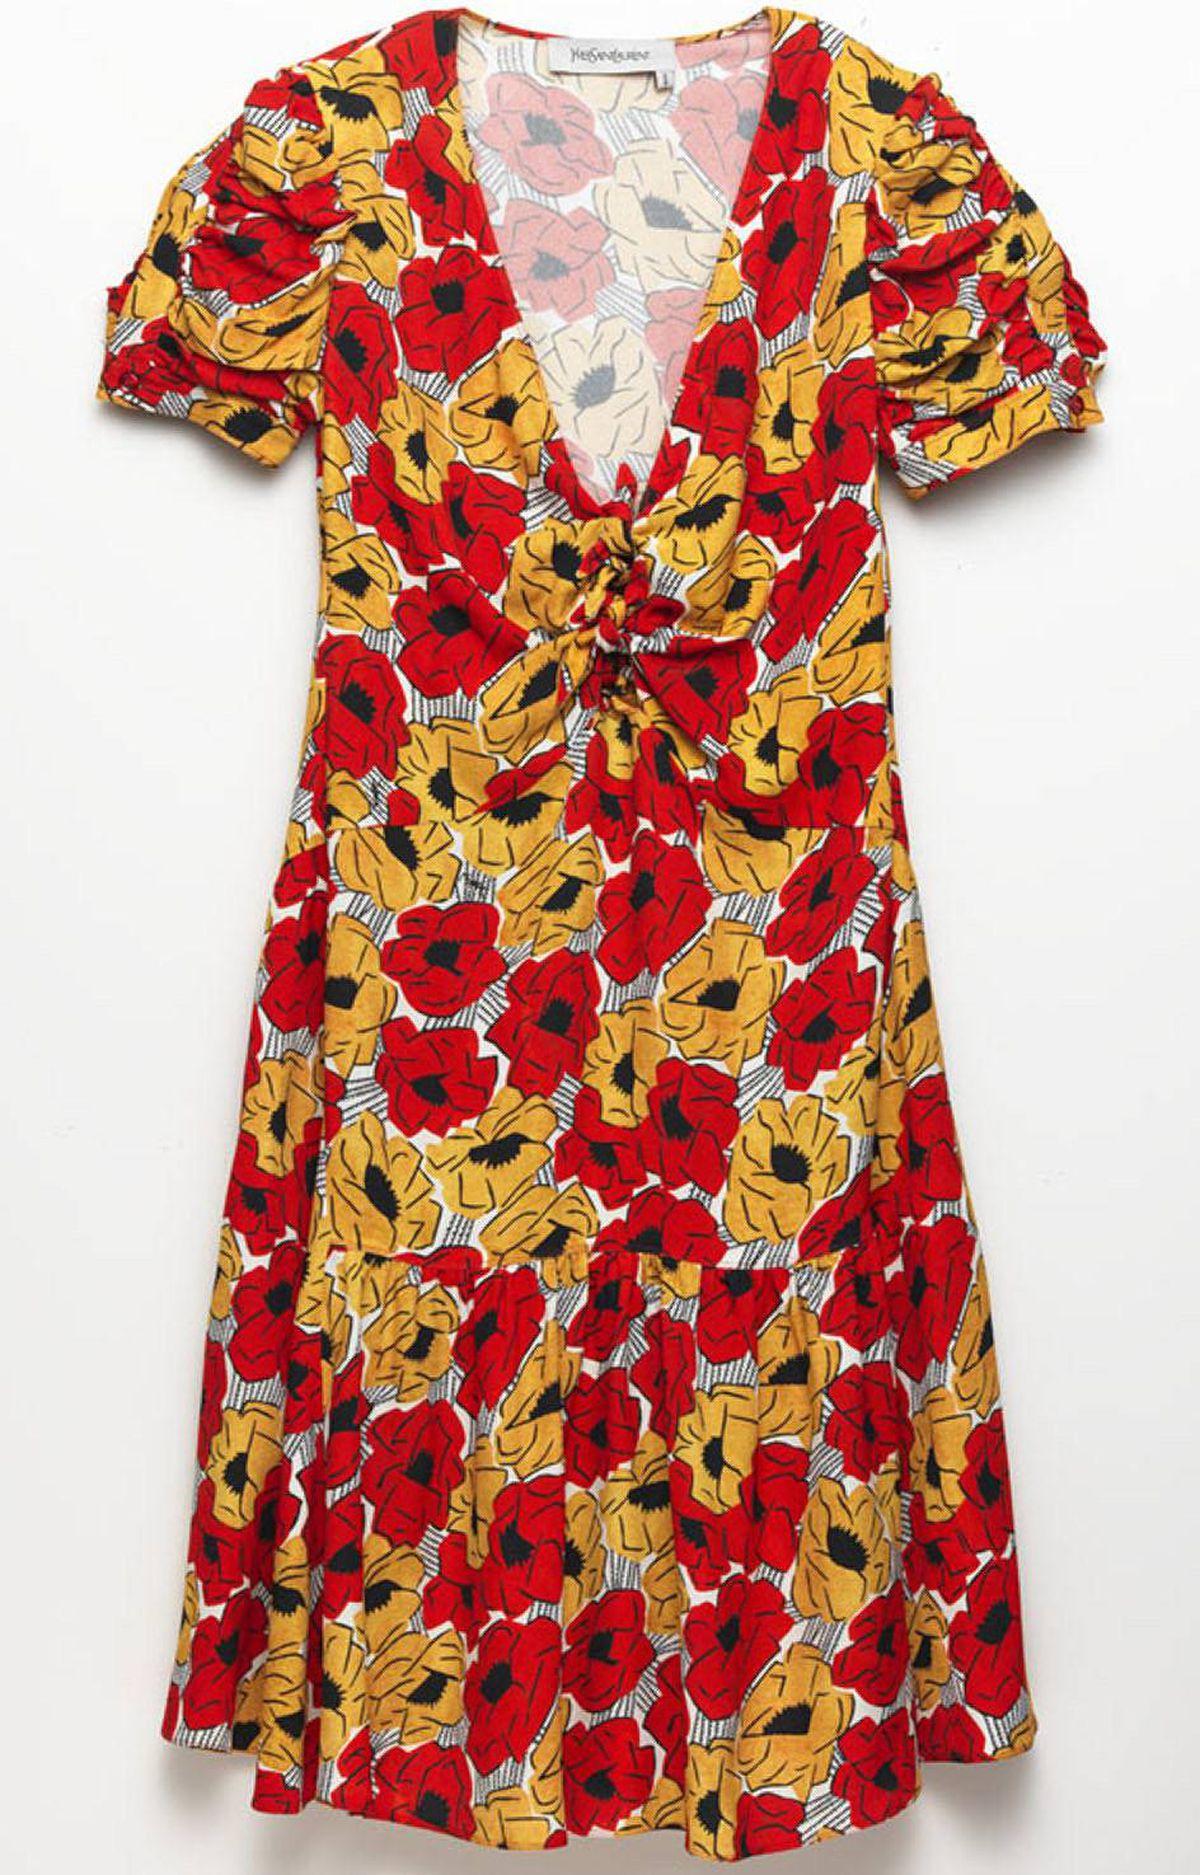 Floral dress by Yves Saint Laurent, $2,290 at Holt Renfrew (www.holtrenfrew.com).